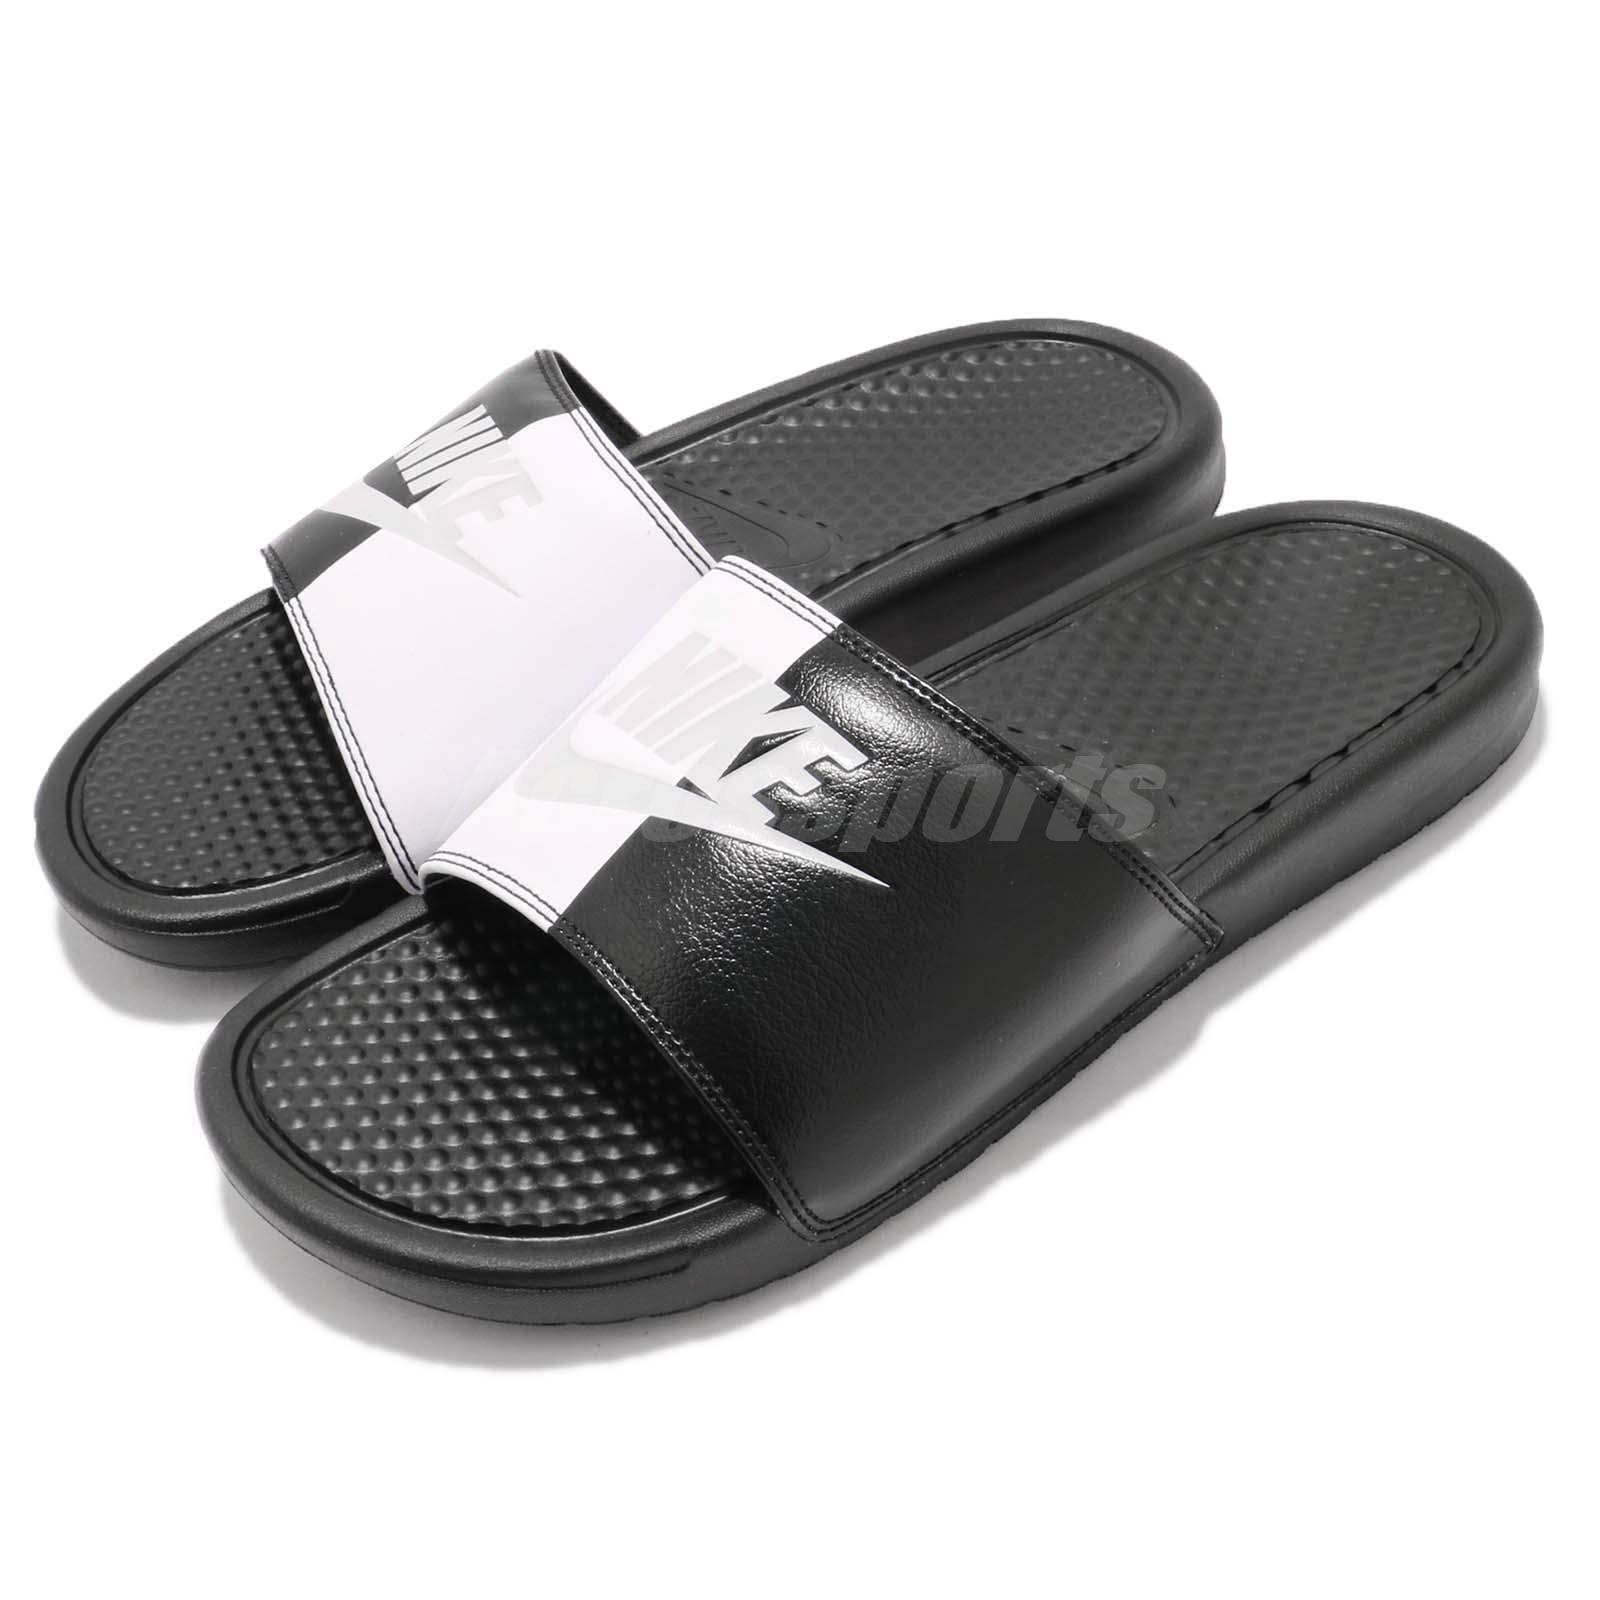 Nike Benassi JDI Black White Yin Yang Men Sports Sandal Slide Slipper 343880-015